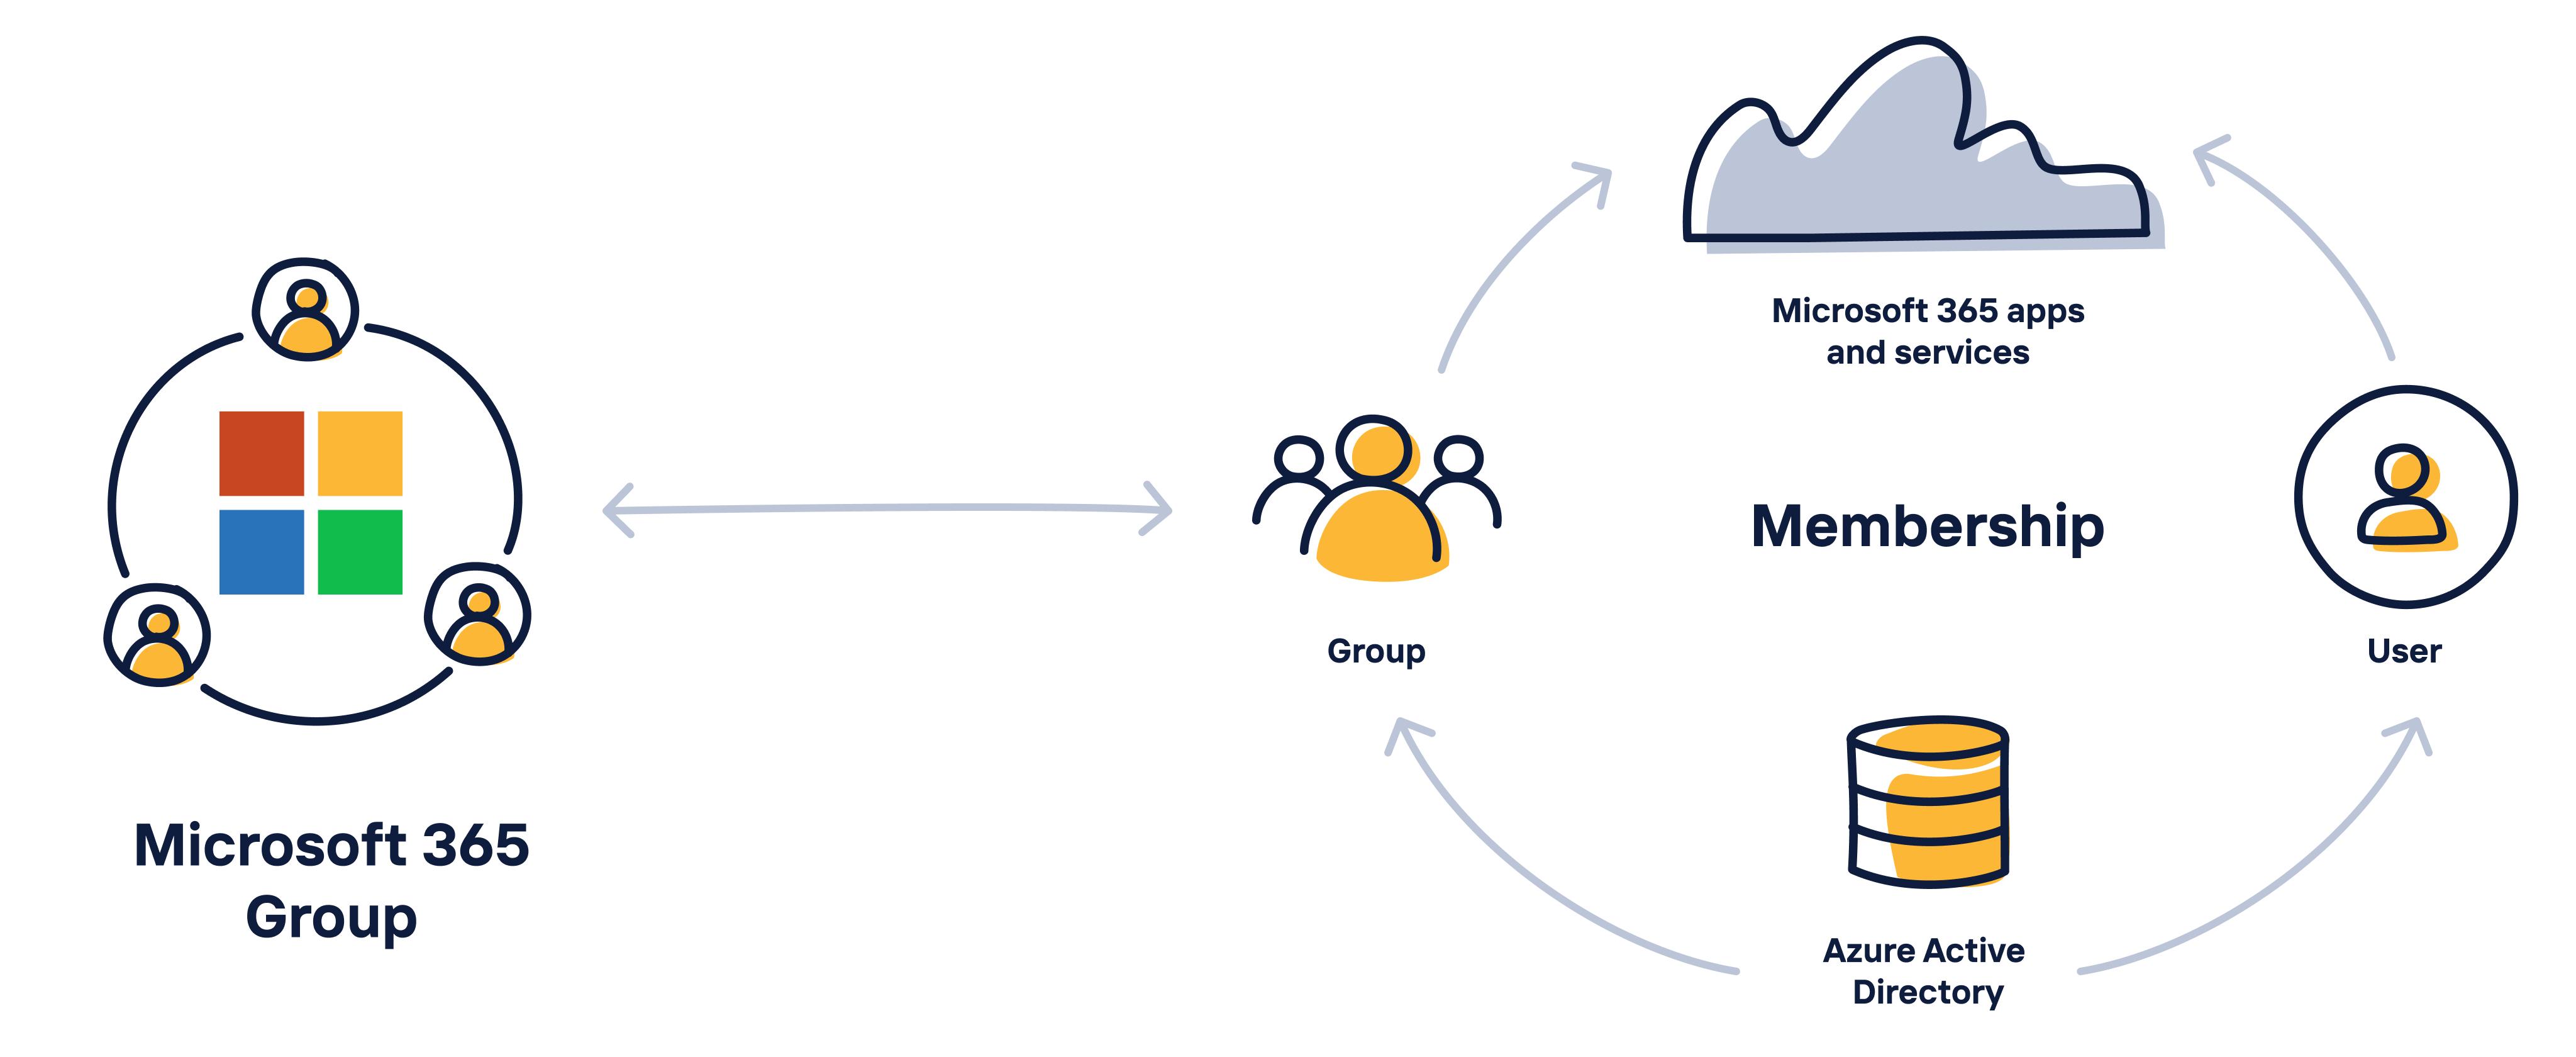 Azure Active Directory Microsoft 365 Groups